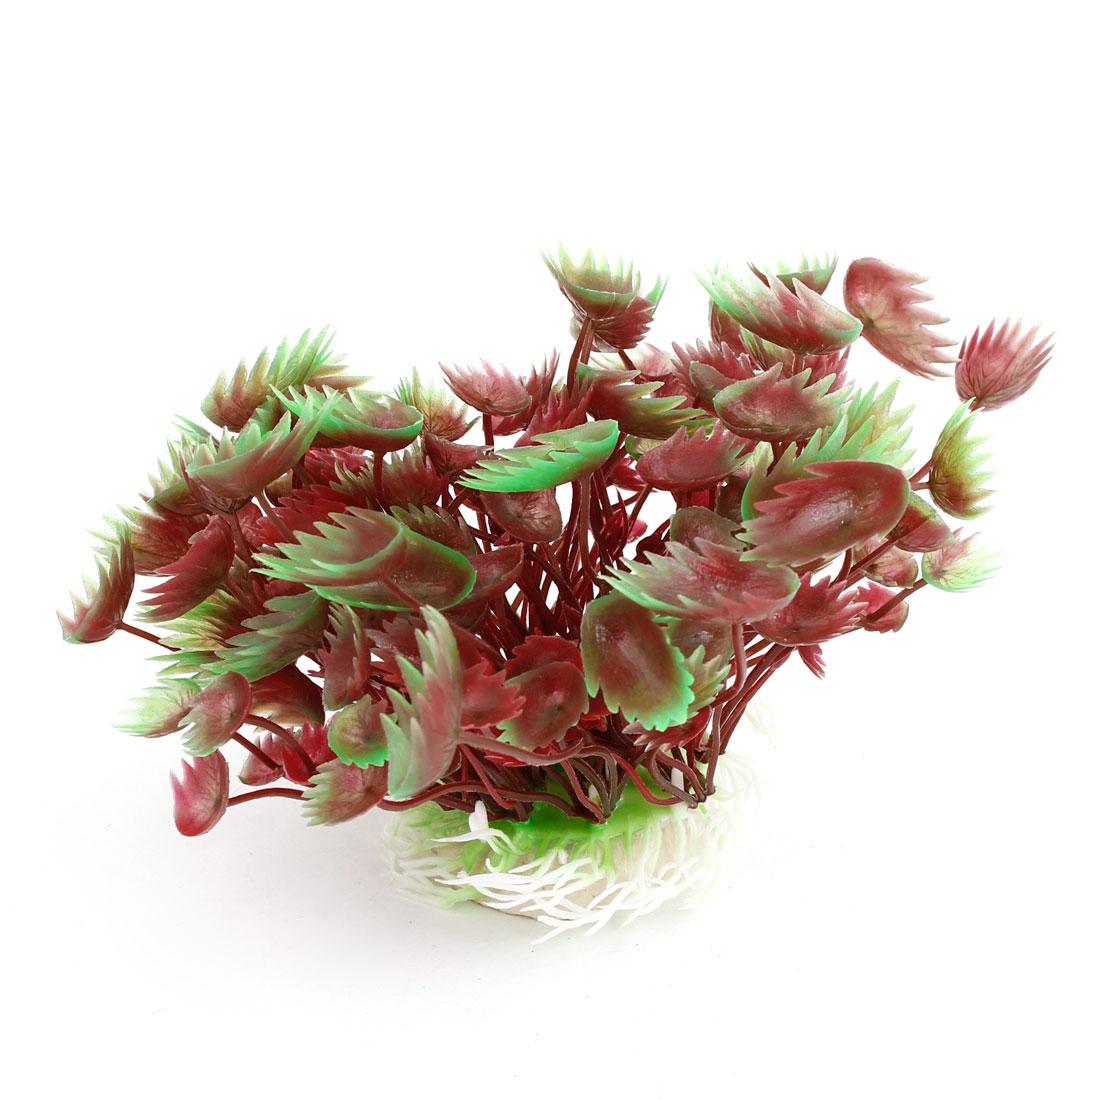 "Ceramic Base Manmade Plastic Green Dark Red Vivid Grass 4.1"" High for Fish Tank"